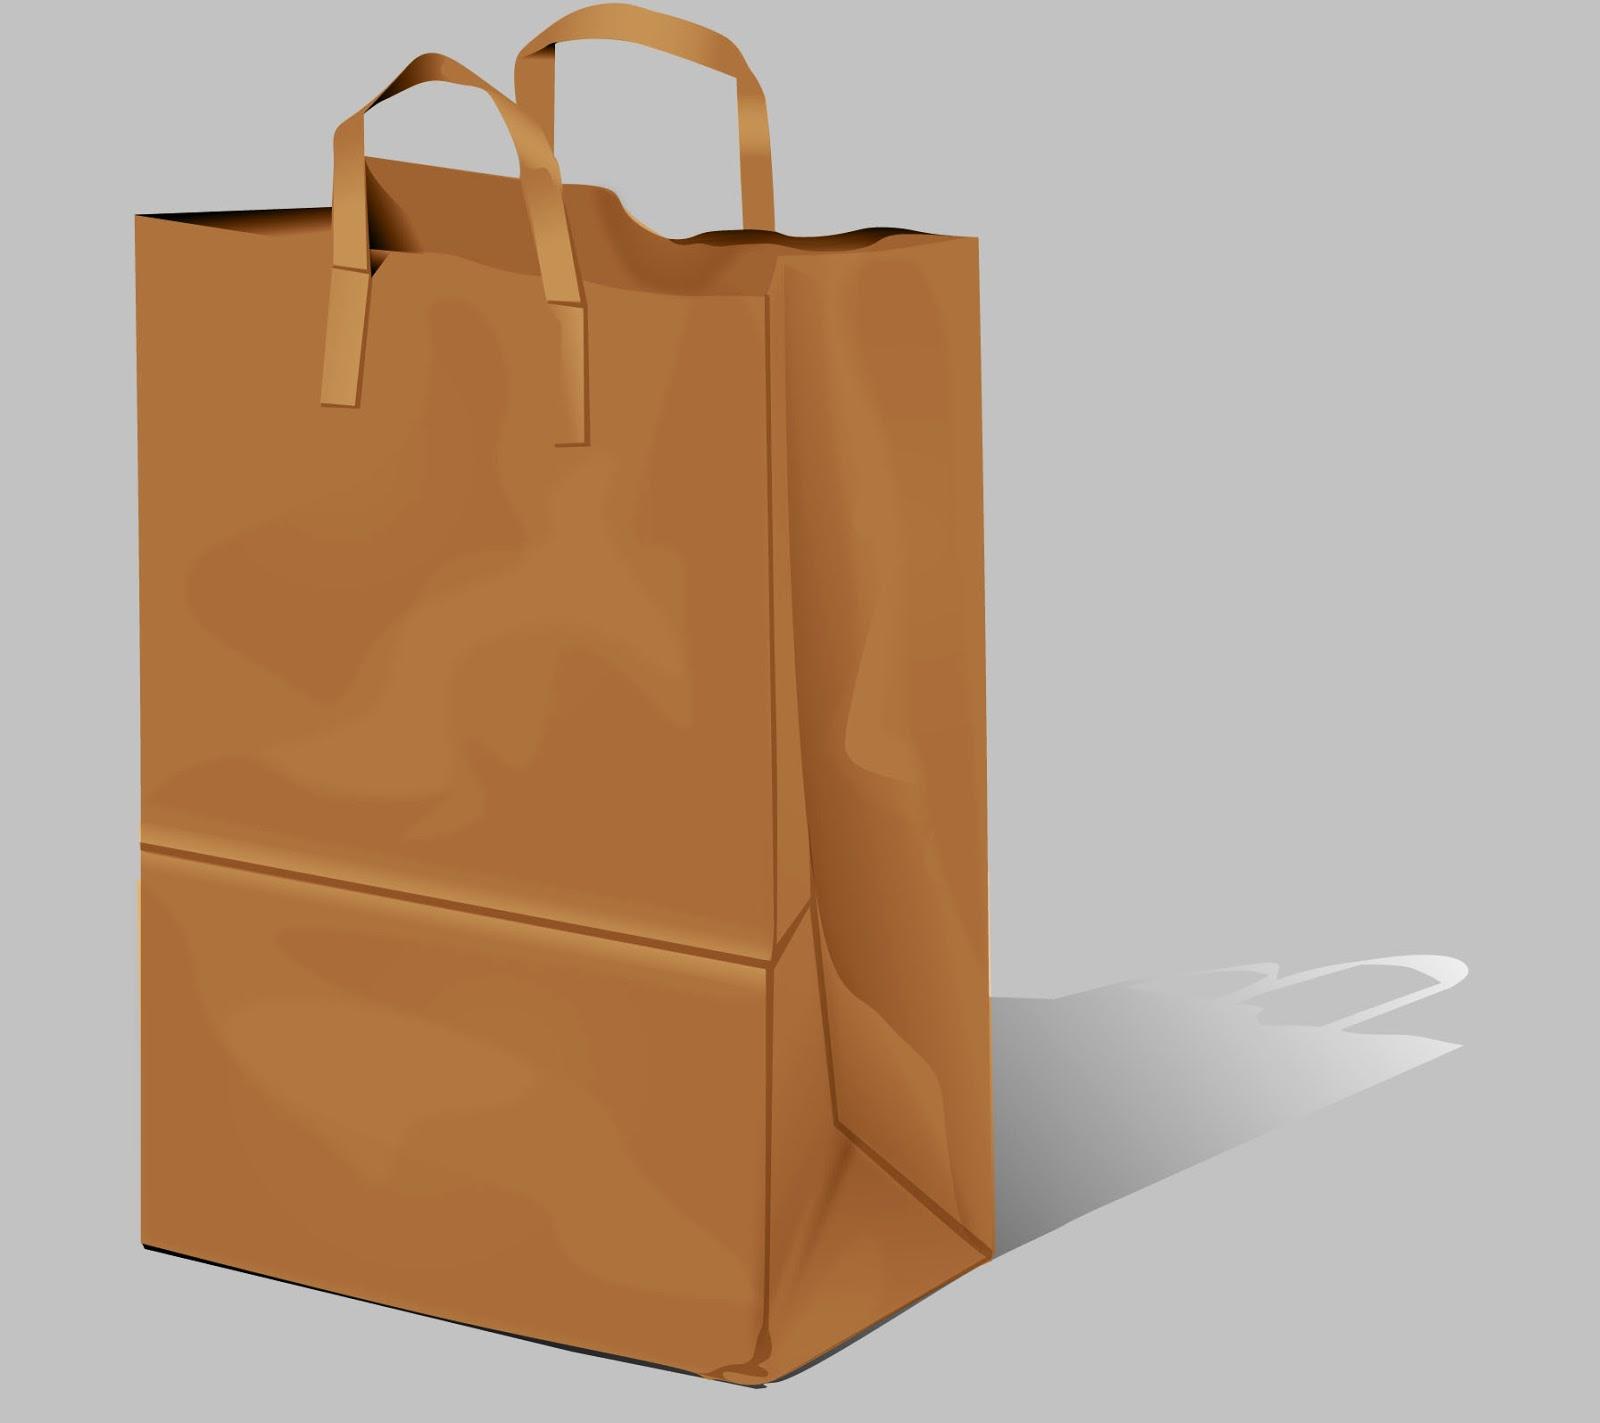 http://4.bp.blogspot.com/-sUXF5GGDNkY/URiOc5w8GxI/AAAAAAAABXc/lCJ0nG6W1xQ/s1600/Paper+Bag.jpg